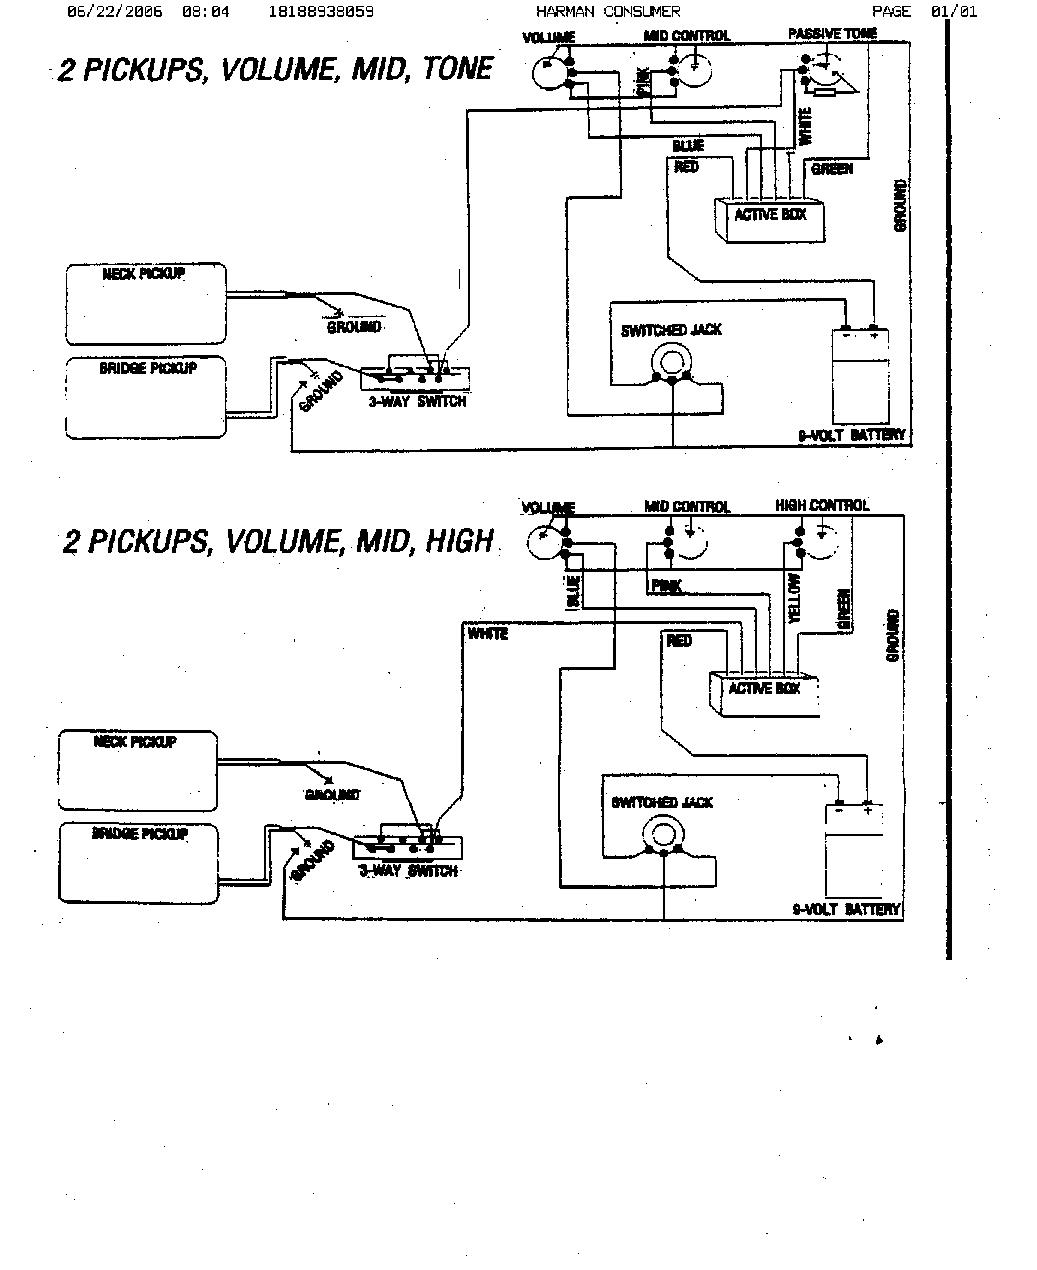 Fabulous Andy Timmons Wiring Diagram Wiring Library Wiring Cloud Loplapiotaidewilluminateatxorg